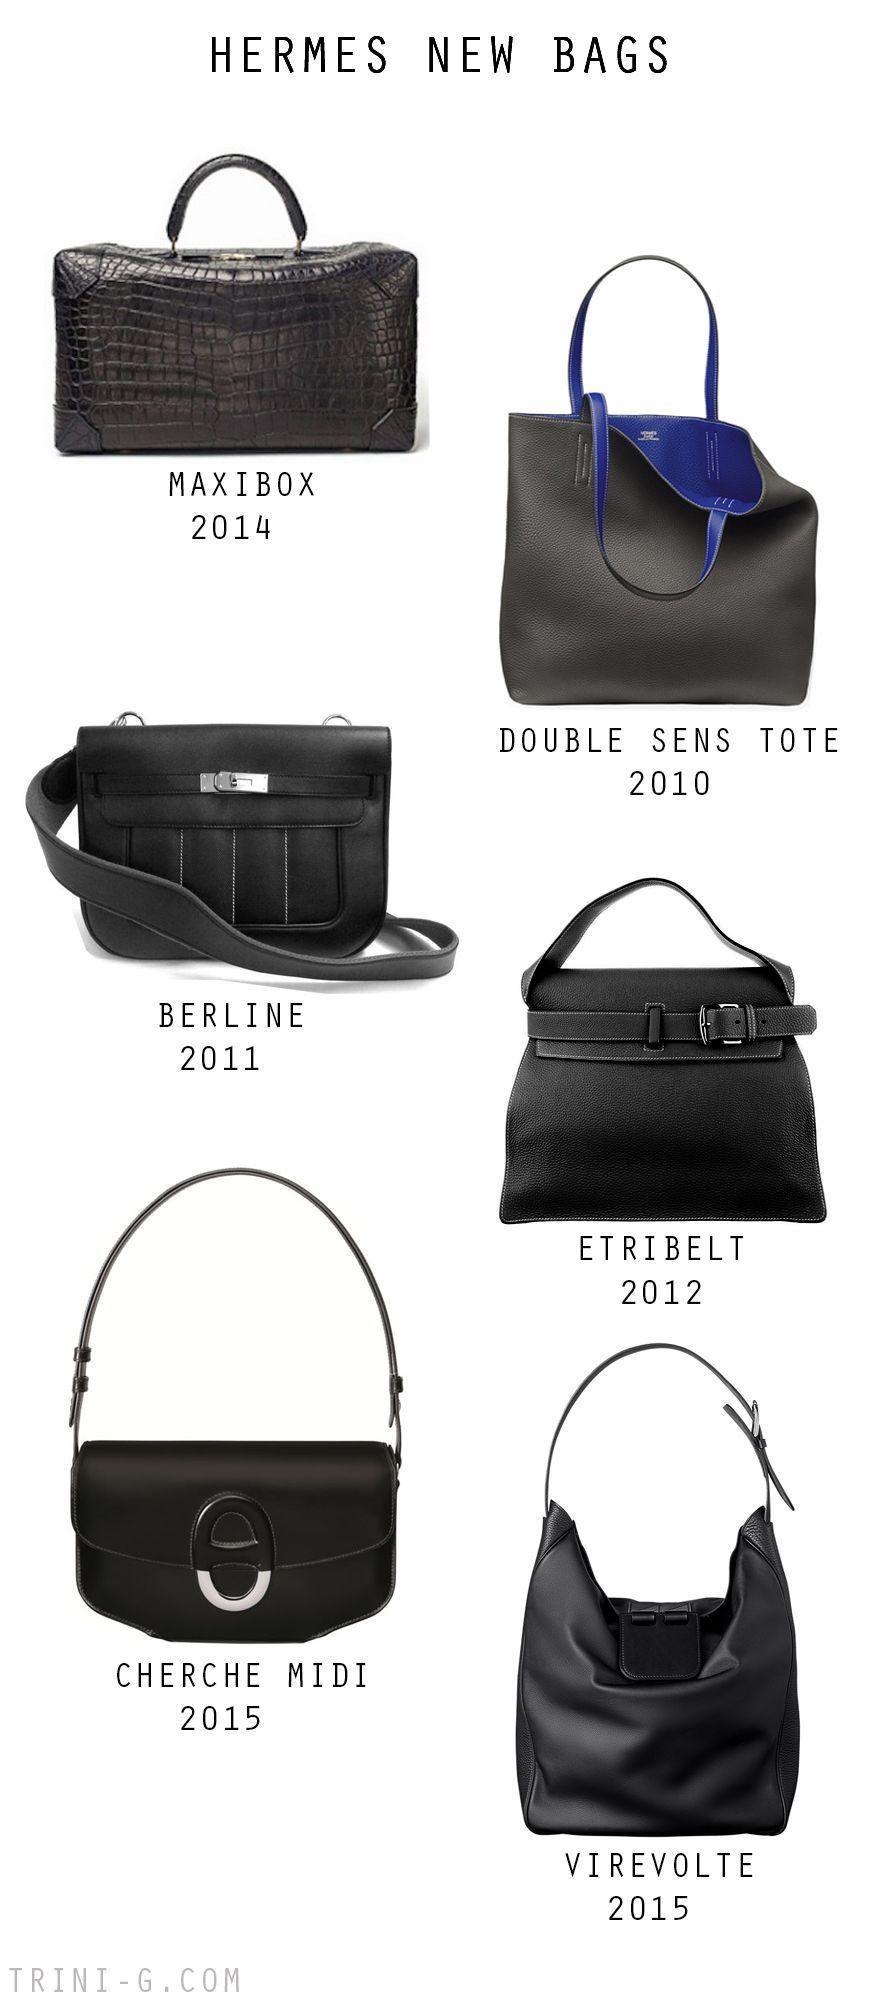 Trini blog   Hermes classic bags   Chanel handbags   Pinterest   Bag ... a2f2d14be4